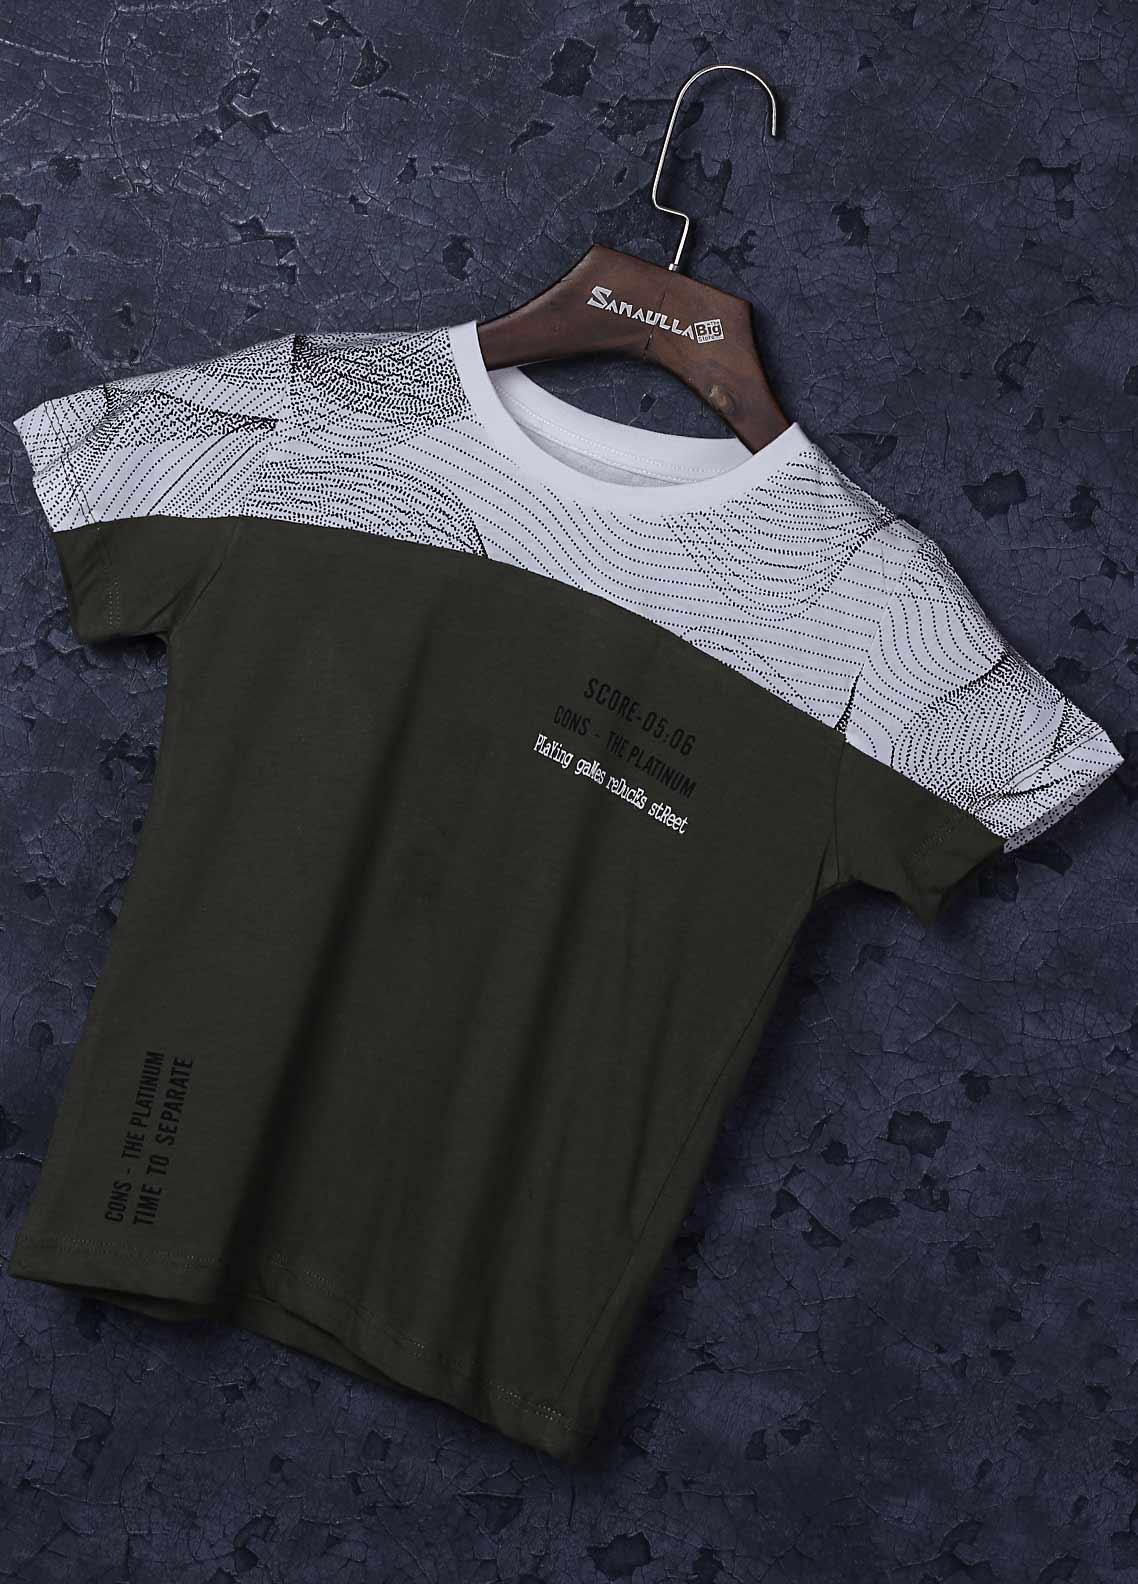 Sanaulla Exclusive Range Cotton Fancy Boys T-Shirts -  3655 Green